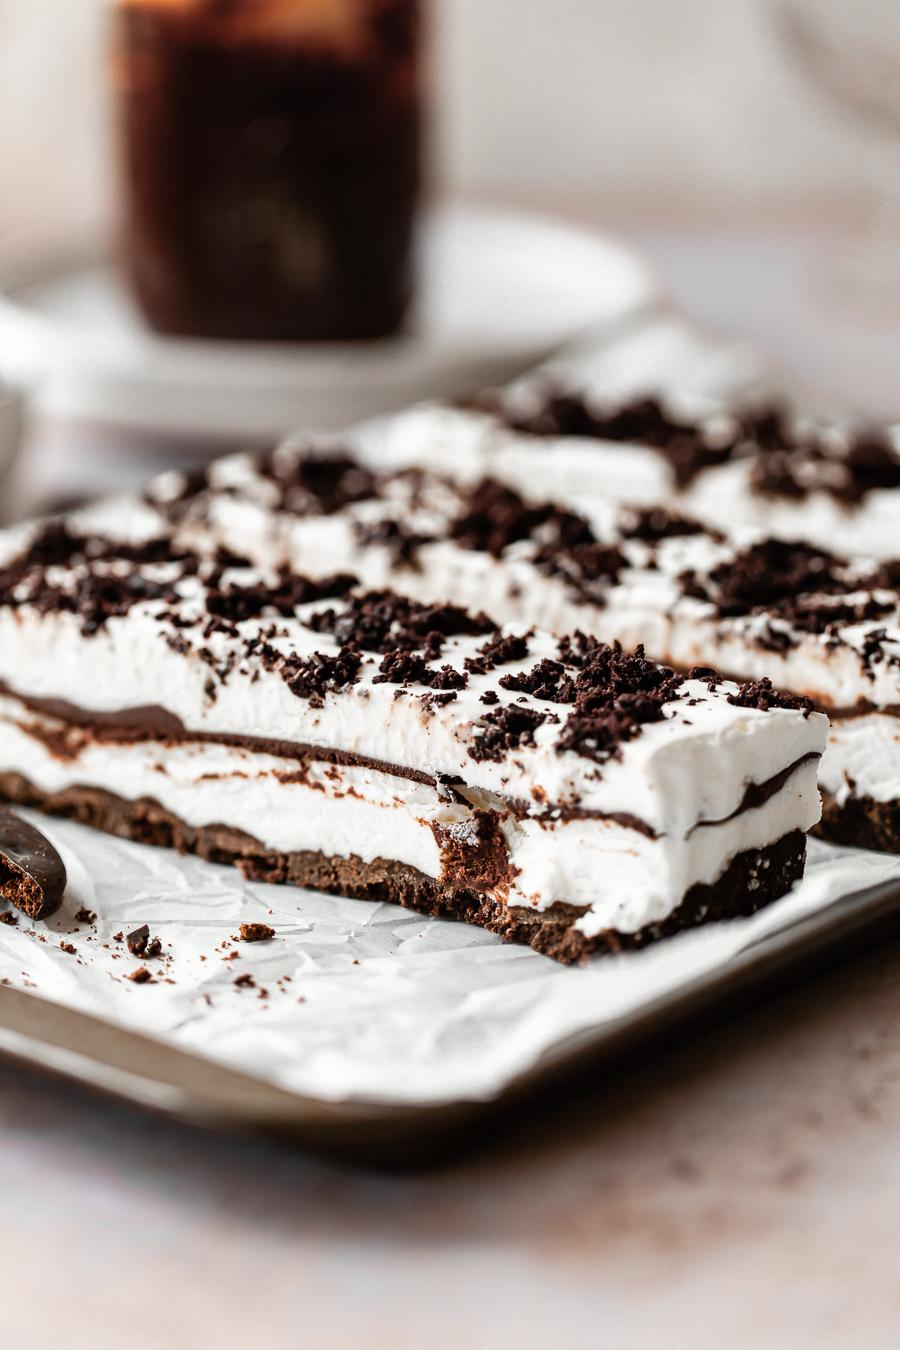 homemade ice cream bars with chocolate layers